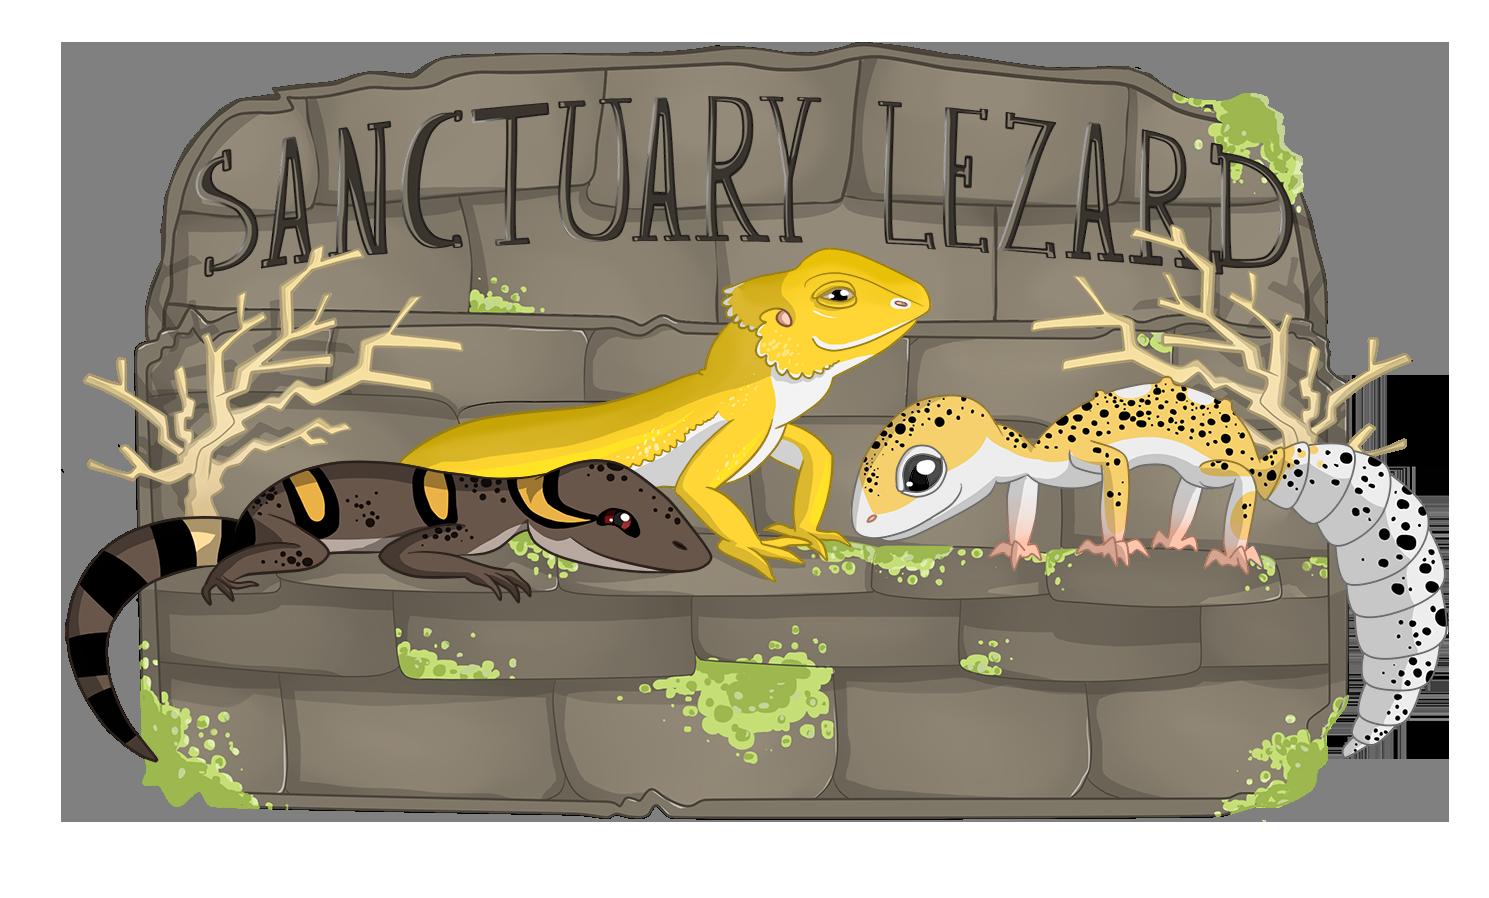 Logo Sanctuary Lezard - 2017